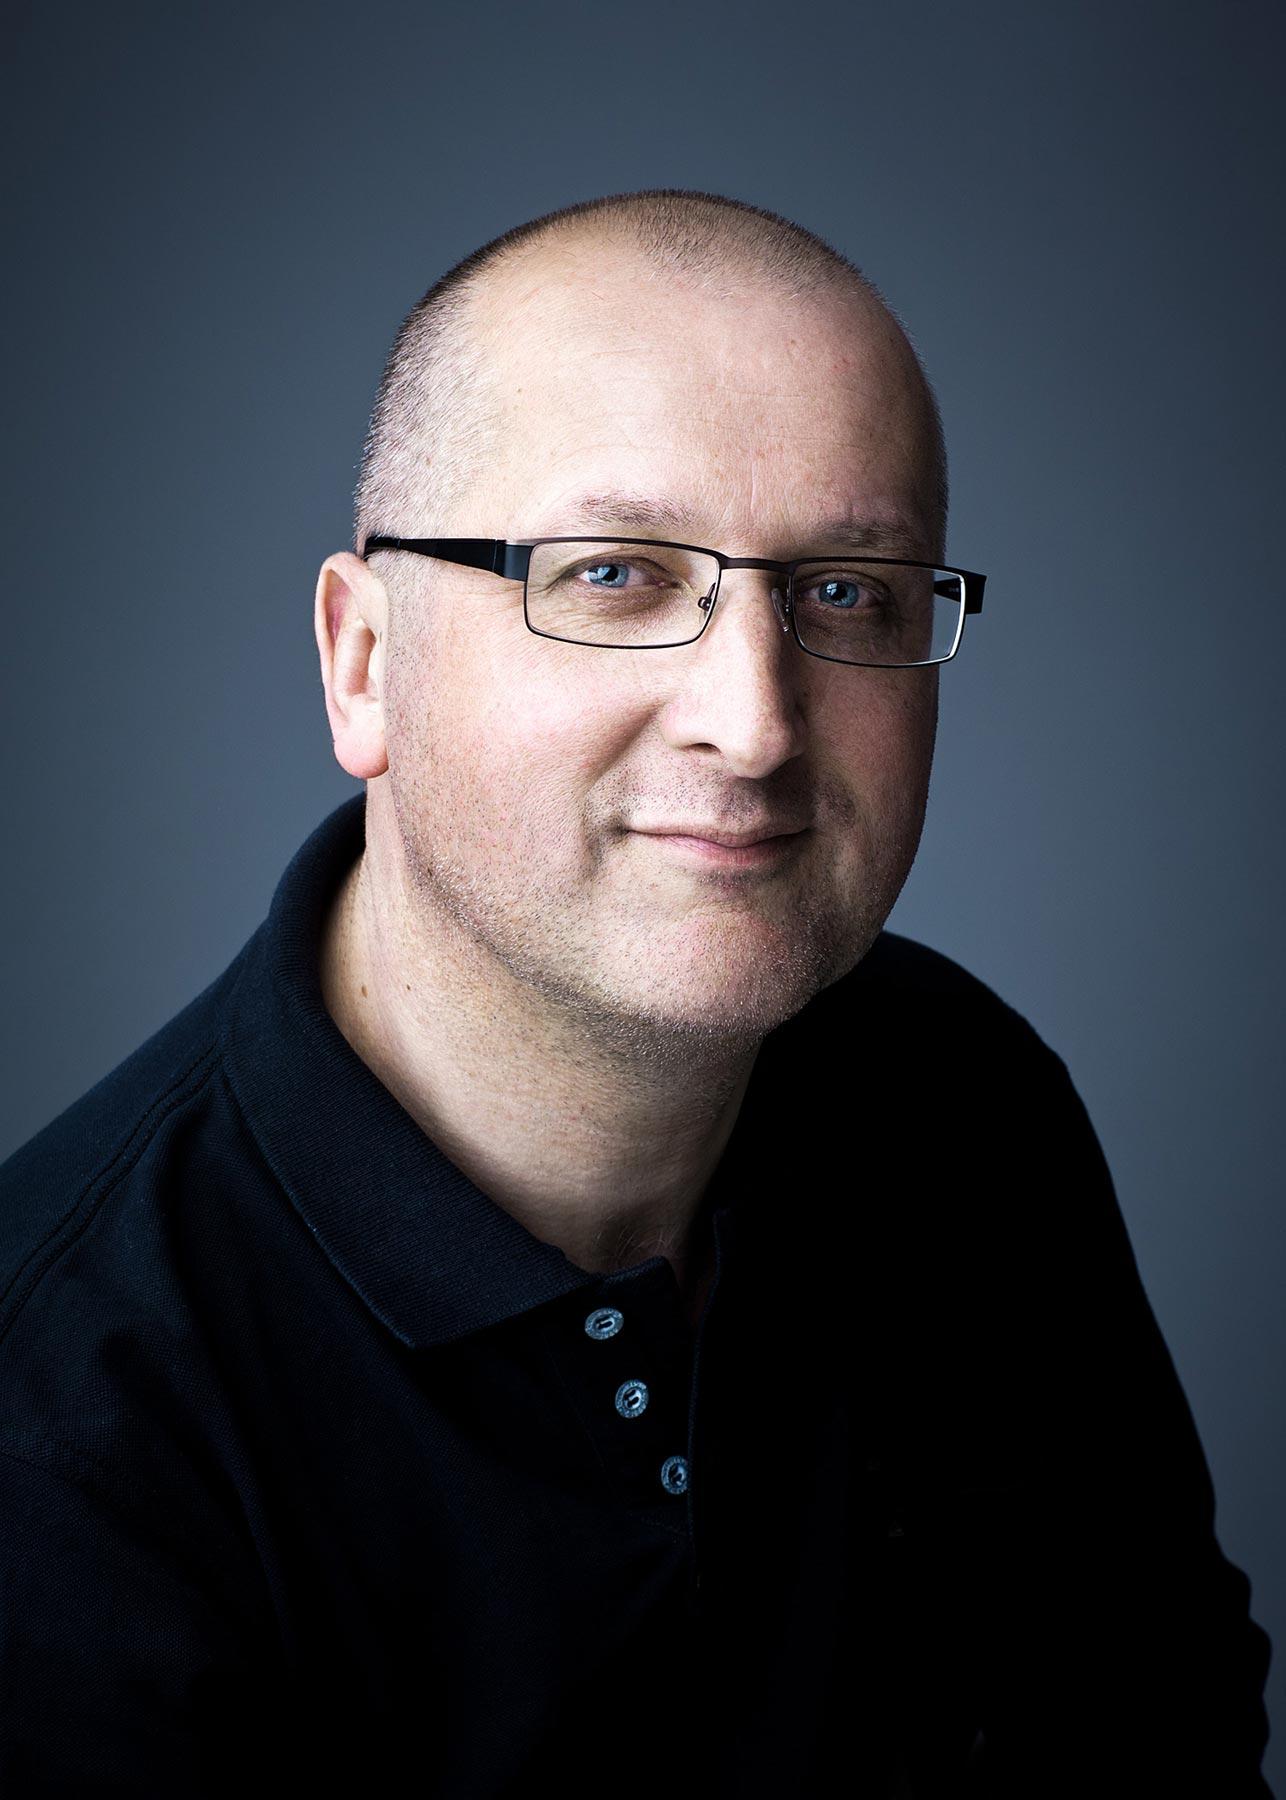 Headshot-Man-glasses.jpg